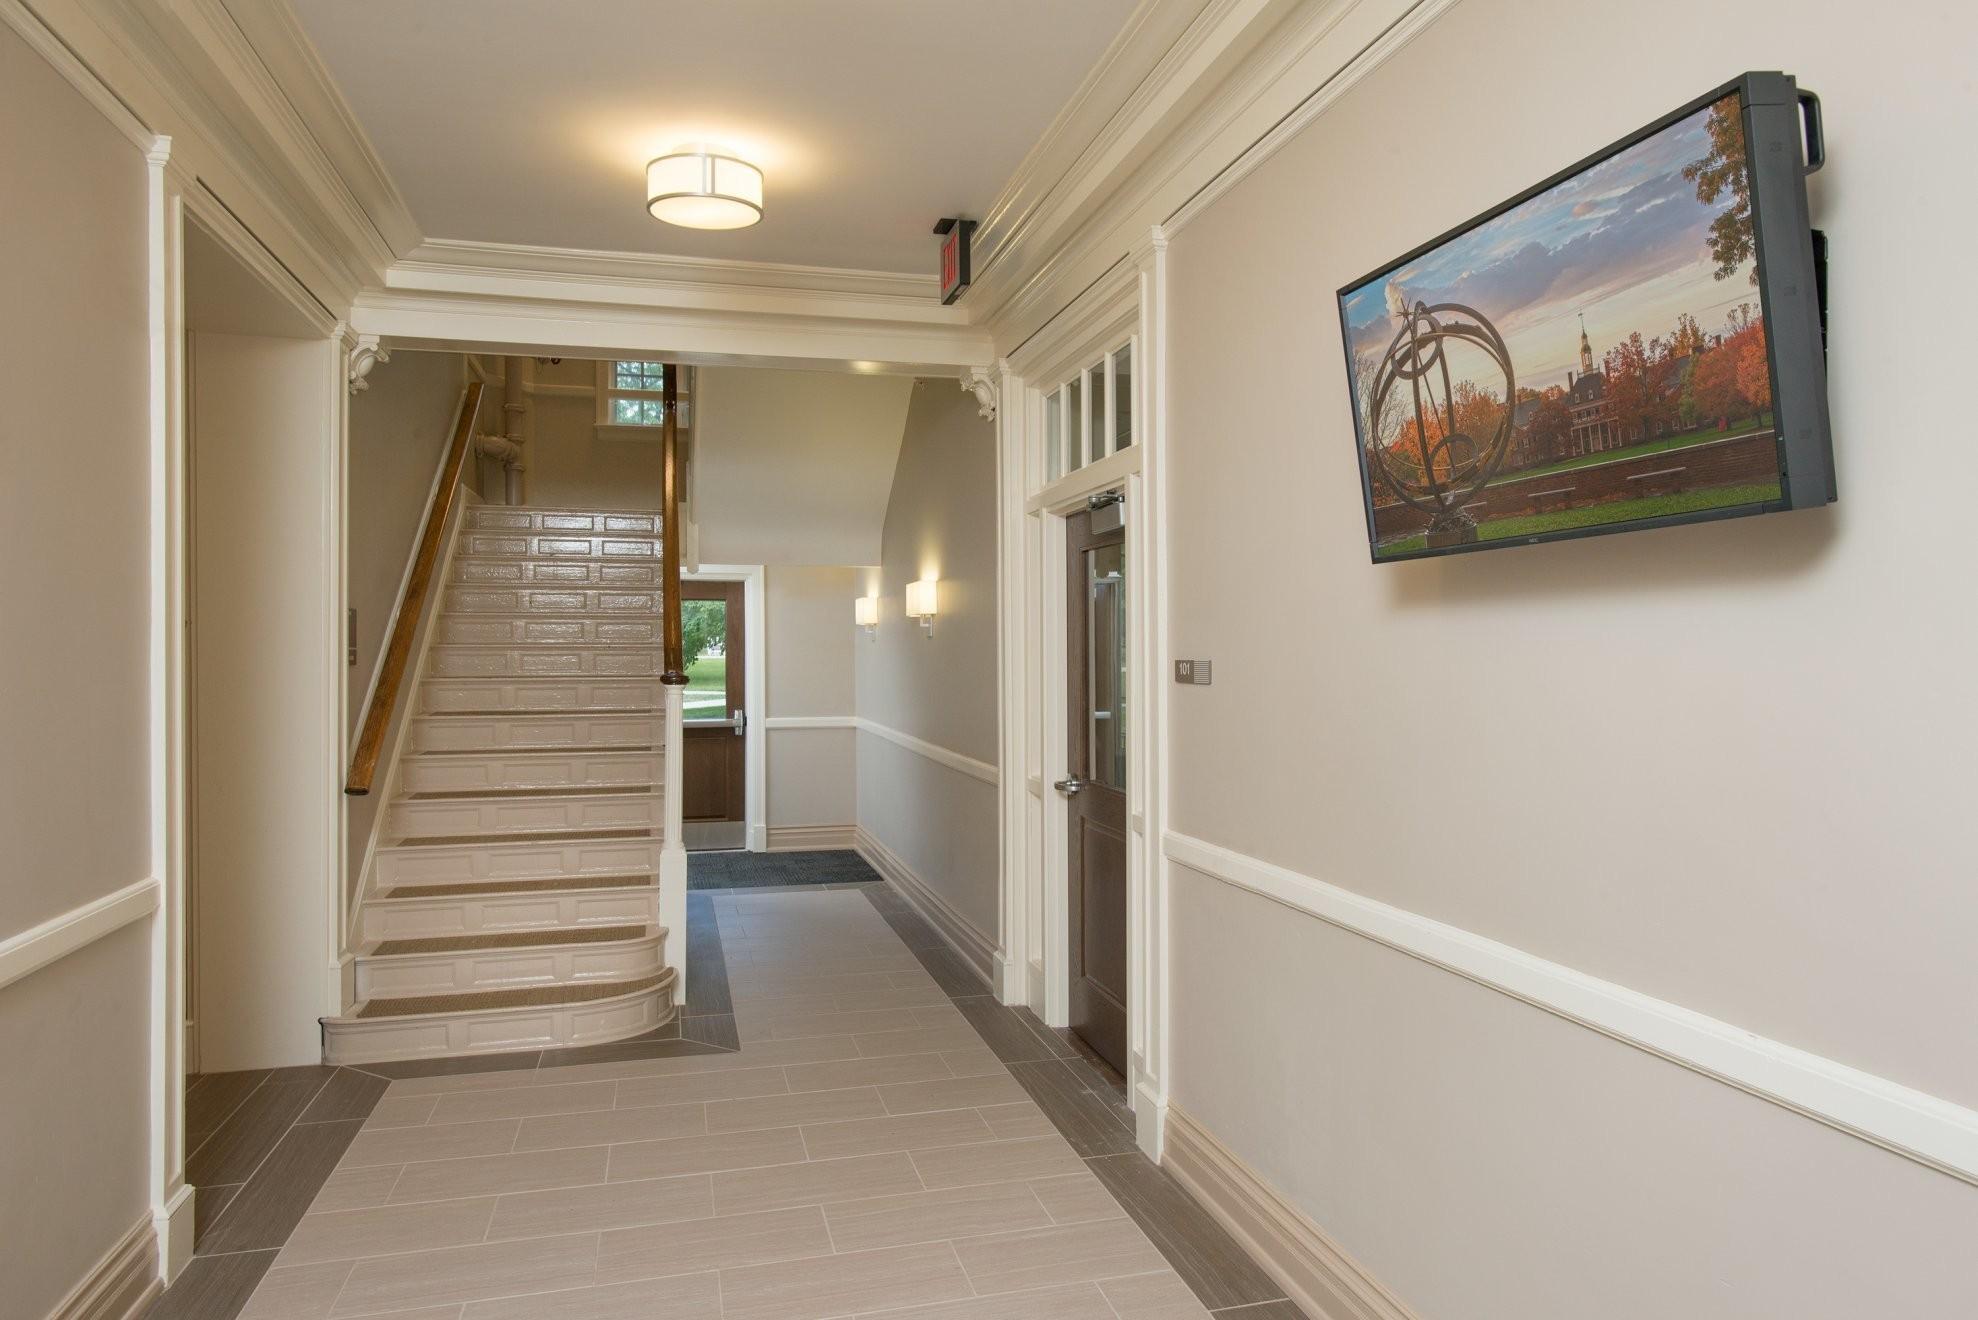 Residence Halls Renovations Case Studies Champlin